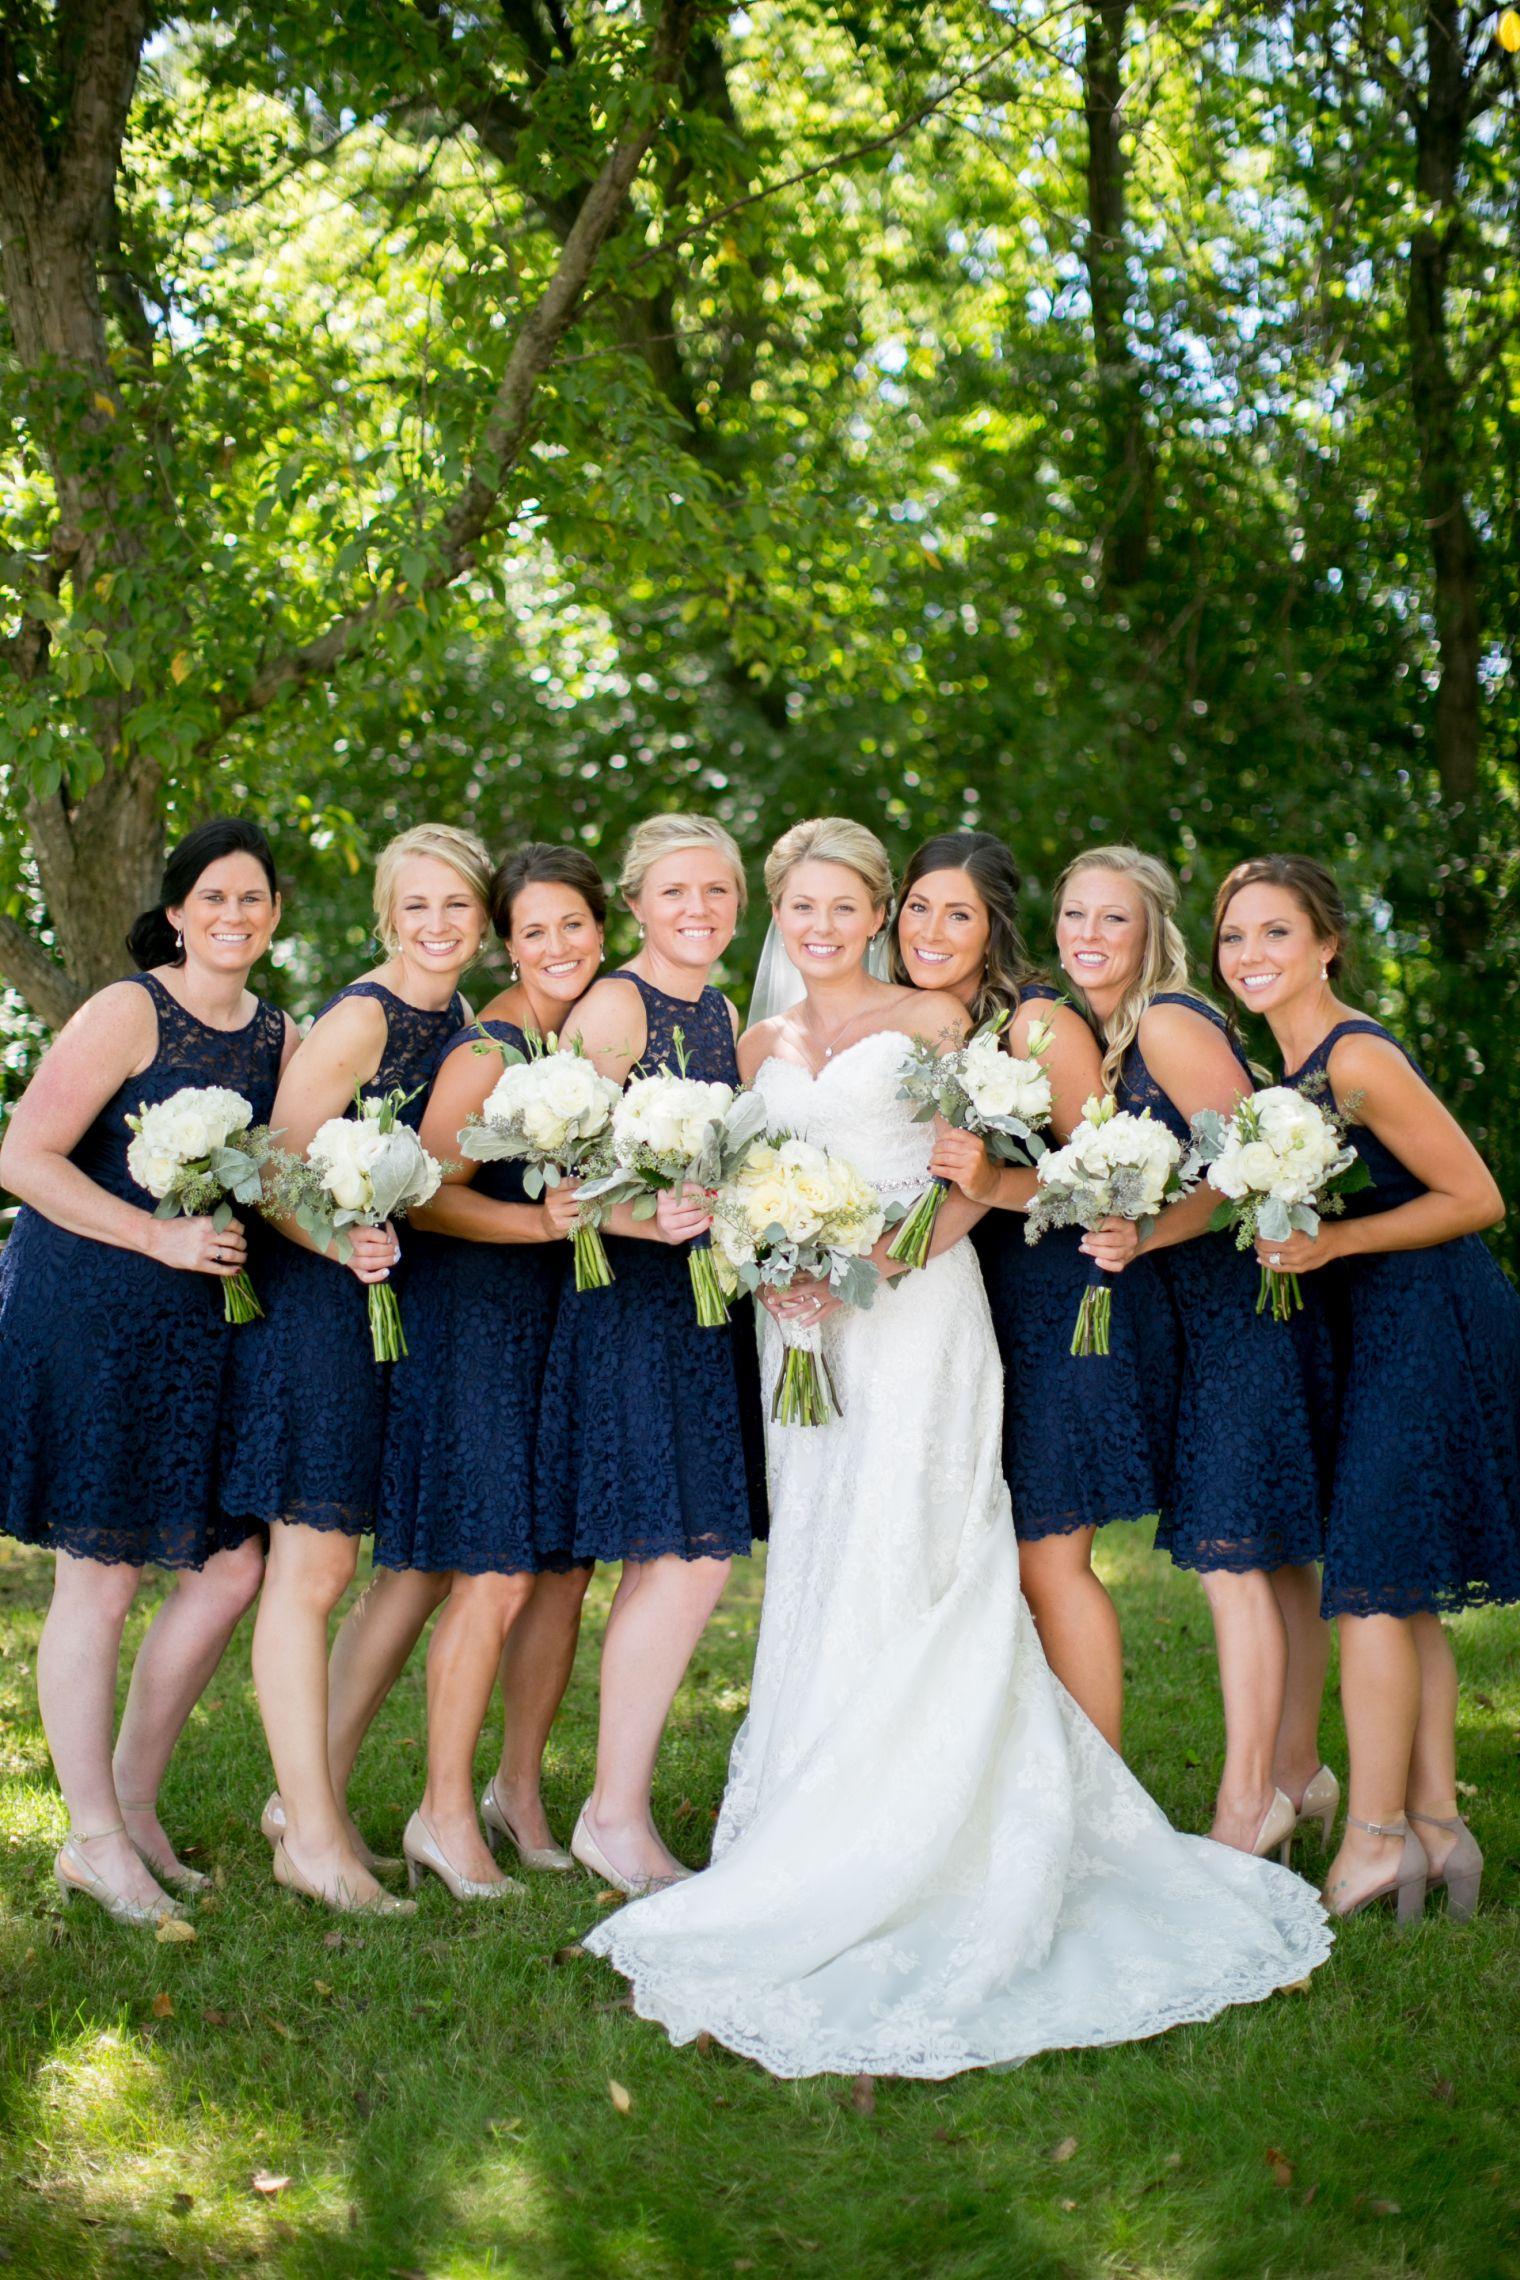 Dbmaids In Navy Blue Bridesmaid Dresses Short Lace Bridesmaid Navy Blue Bridesmaid Dresses Short Blue Bridesmaid Dresses Short Short Lace Bridesmaid Dresses